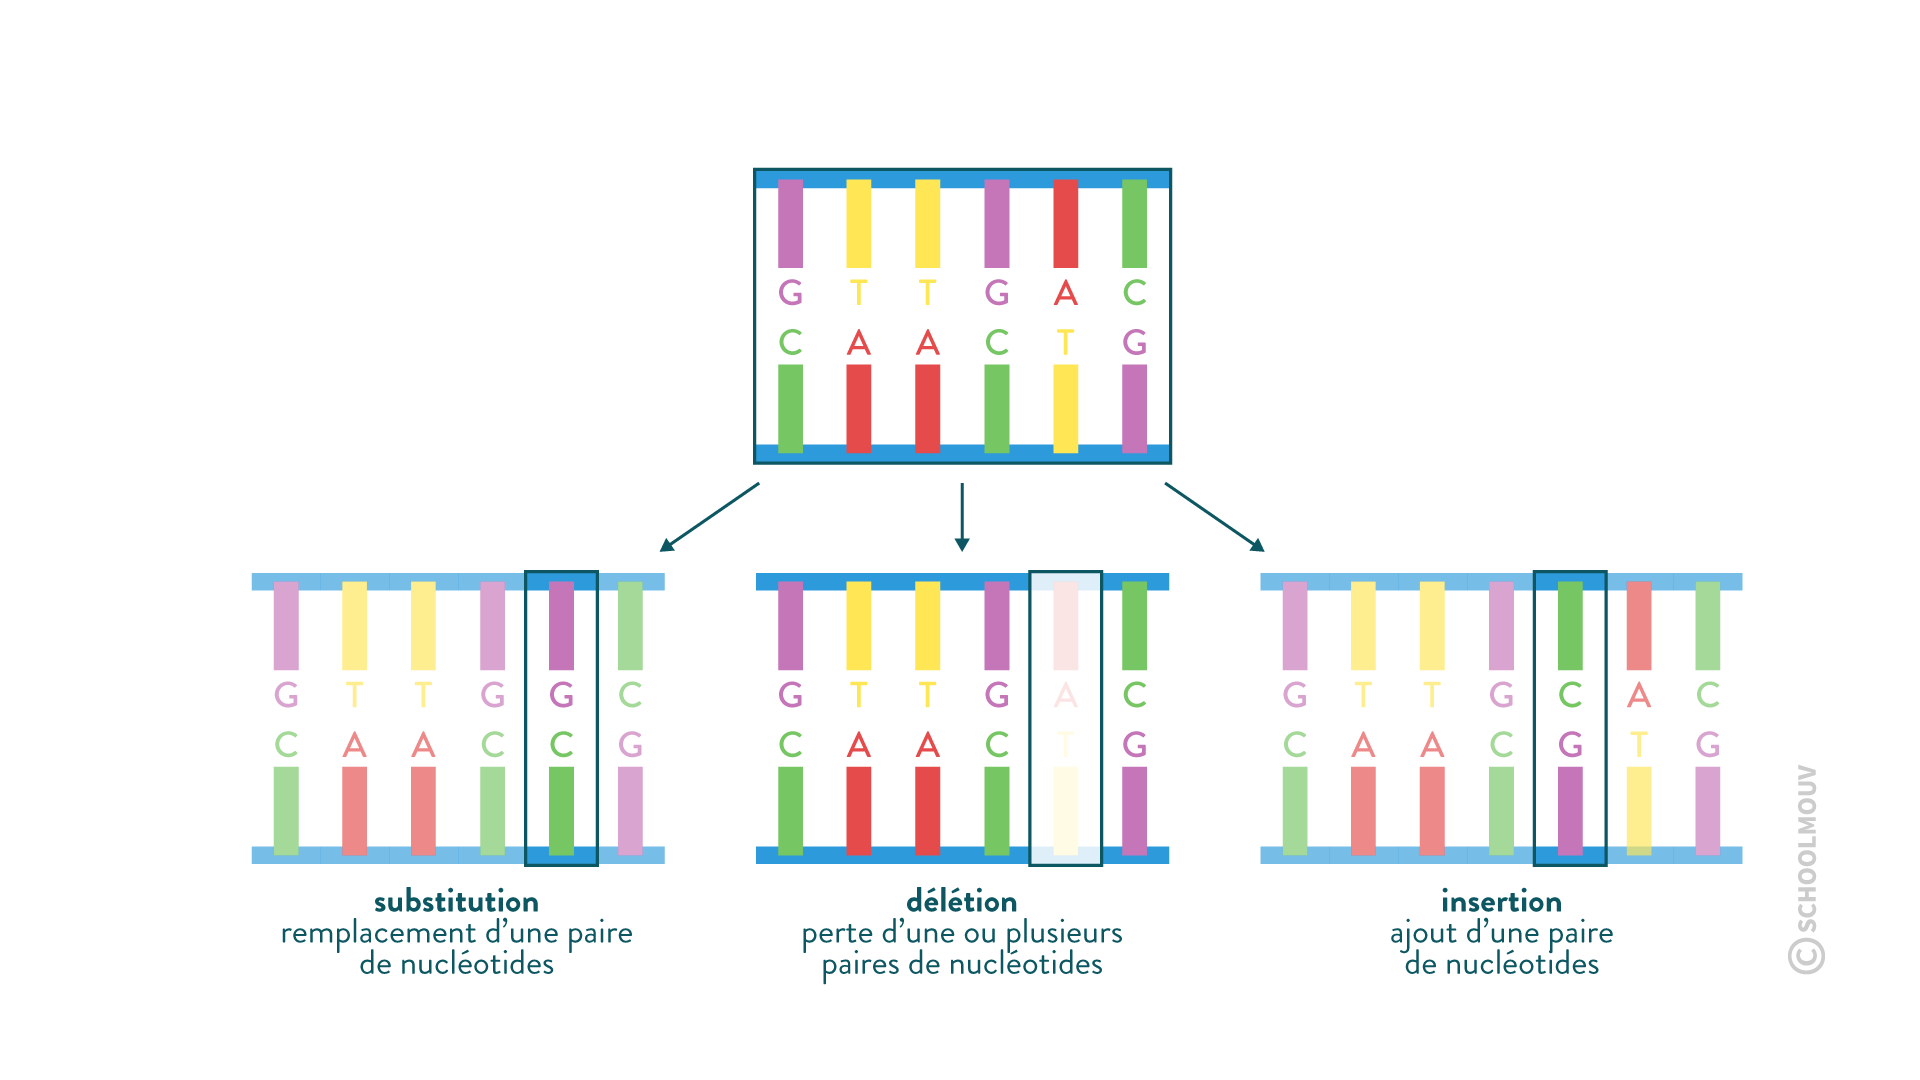 mutations ADN erreur réplication nucléotide délétion substitution insertion